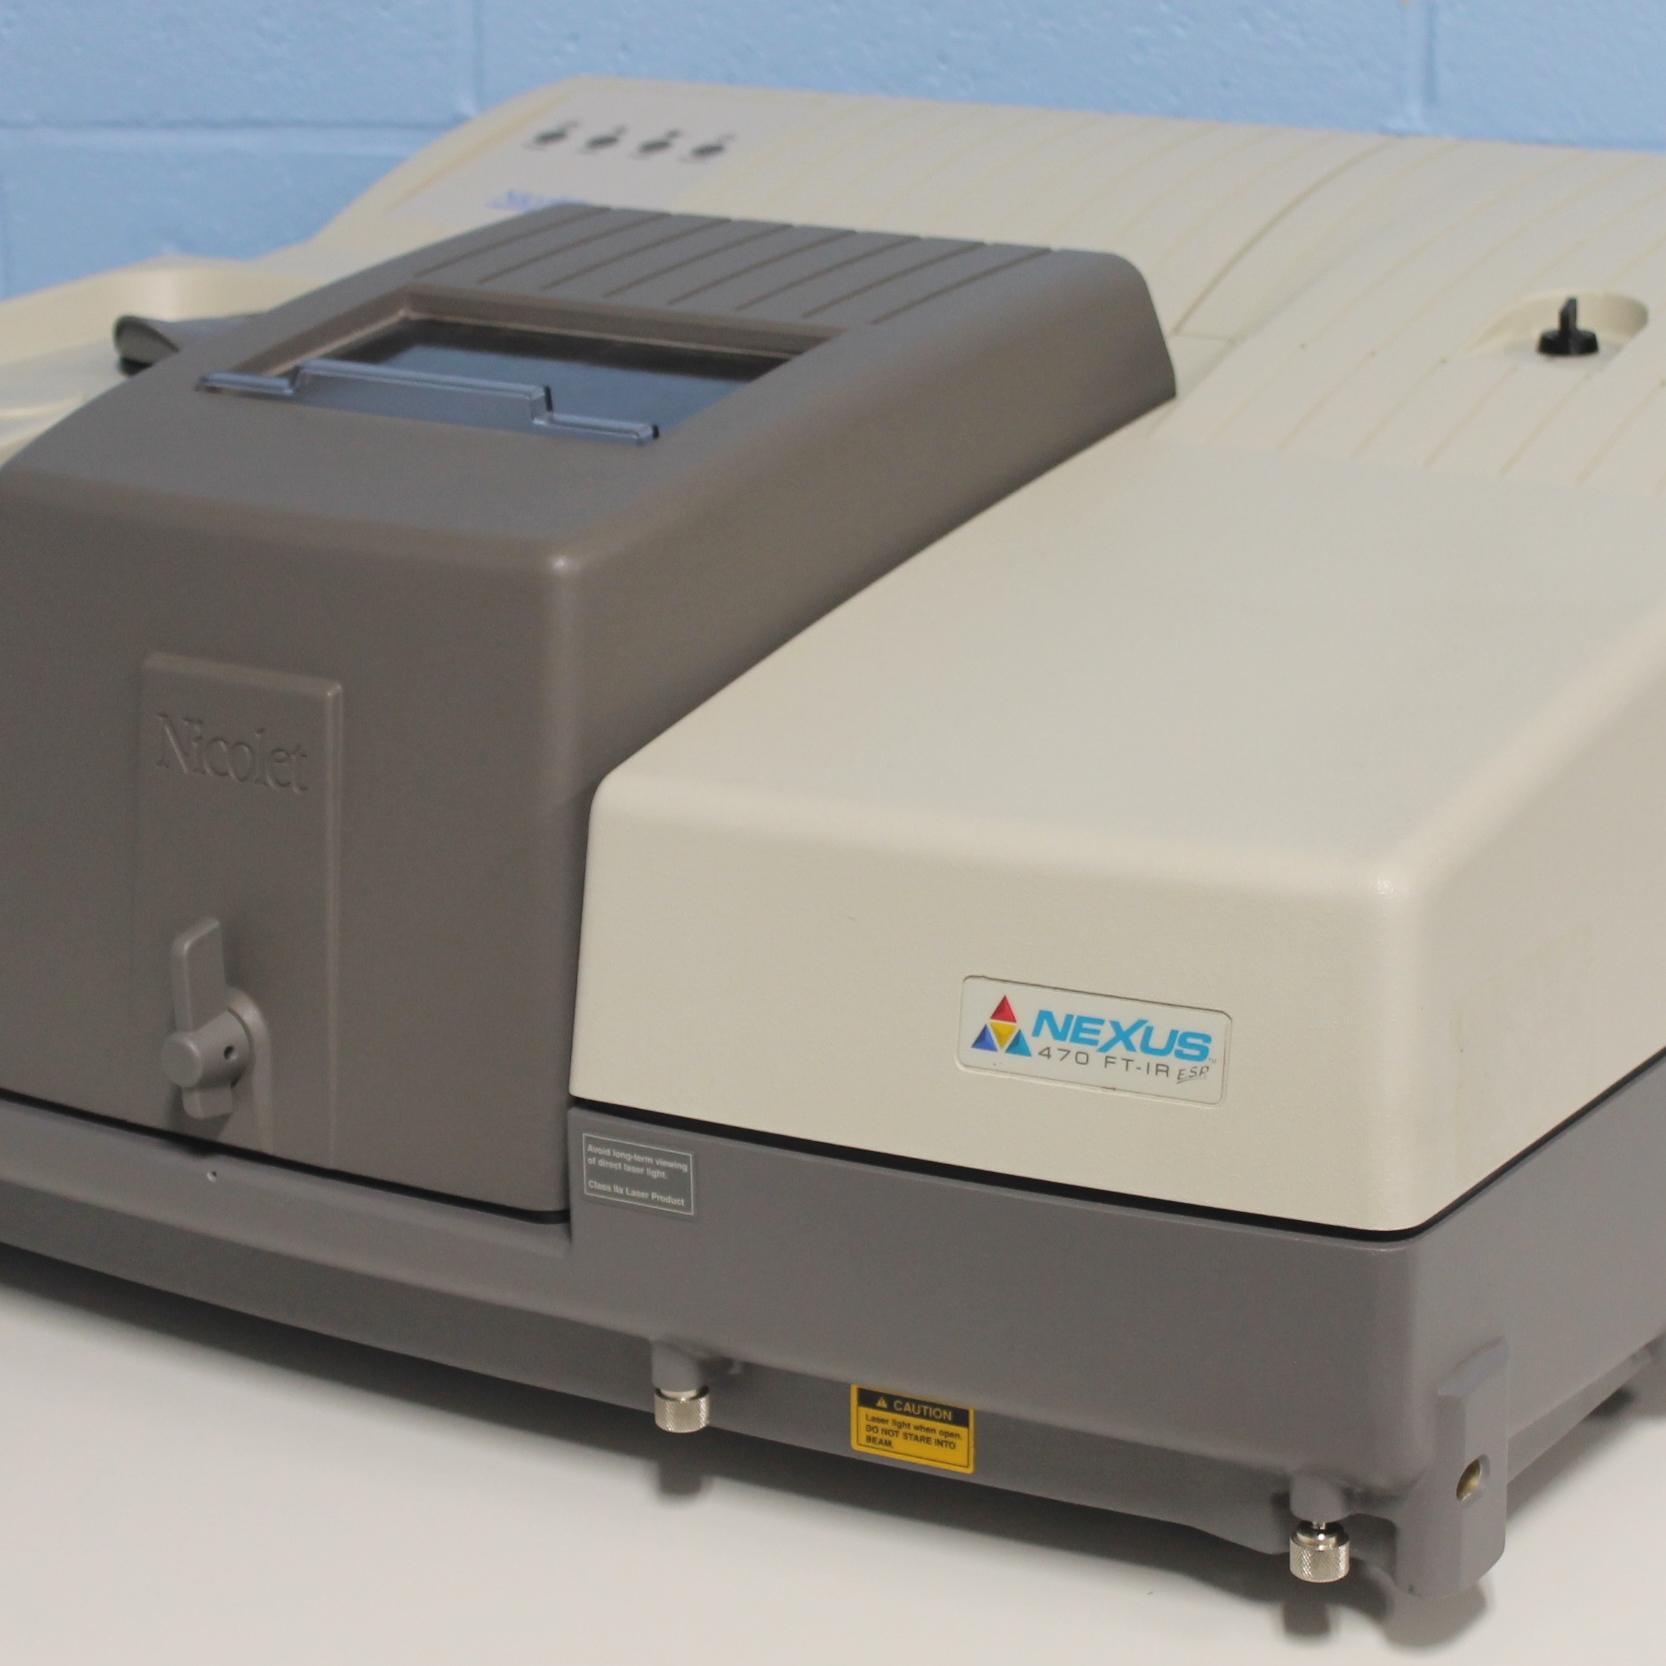 Nicolet Nexus 470 ESP FT-IR Spectrometer with Spectra-Tech Continuum FT-IR Microscope System Image